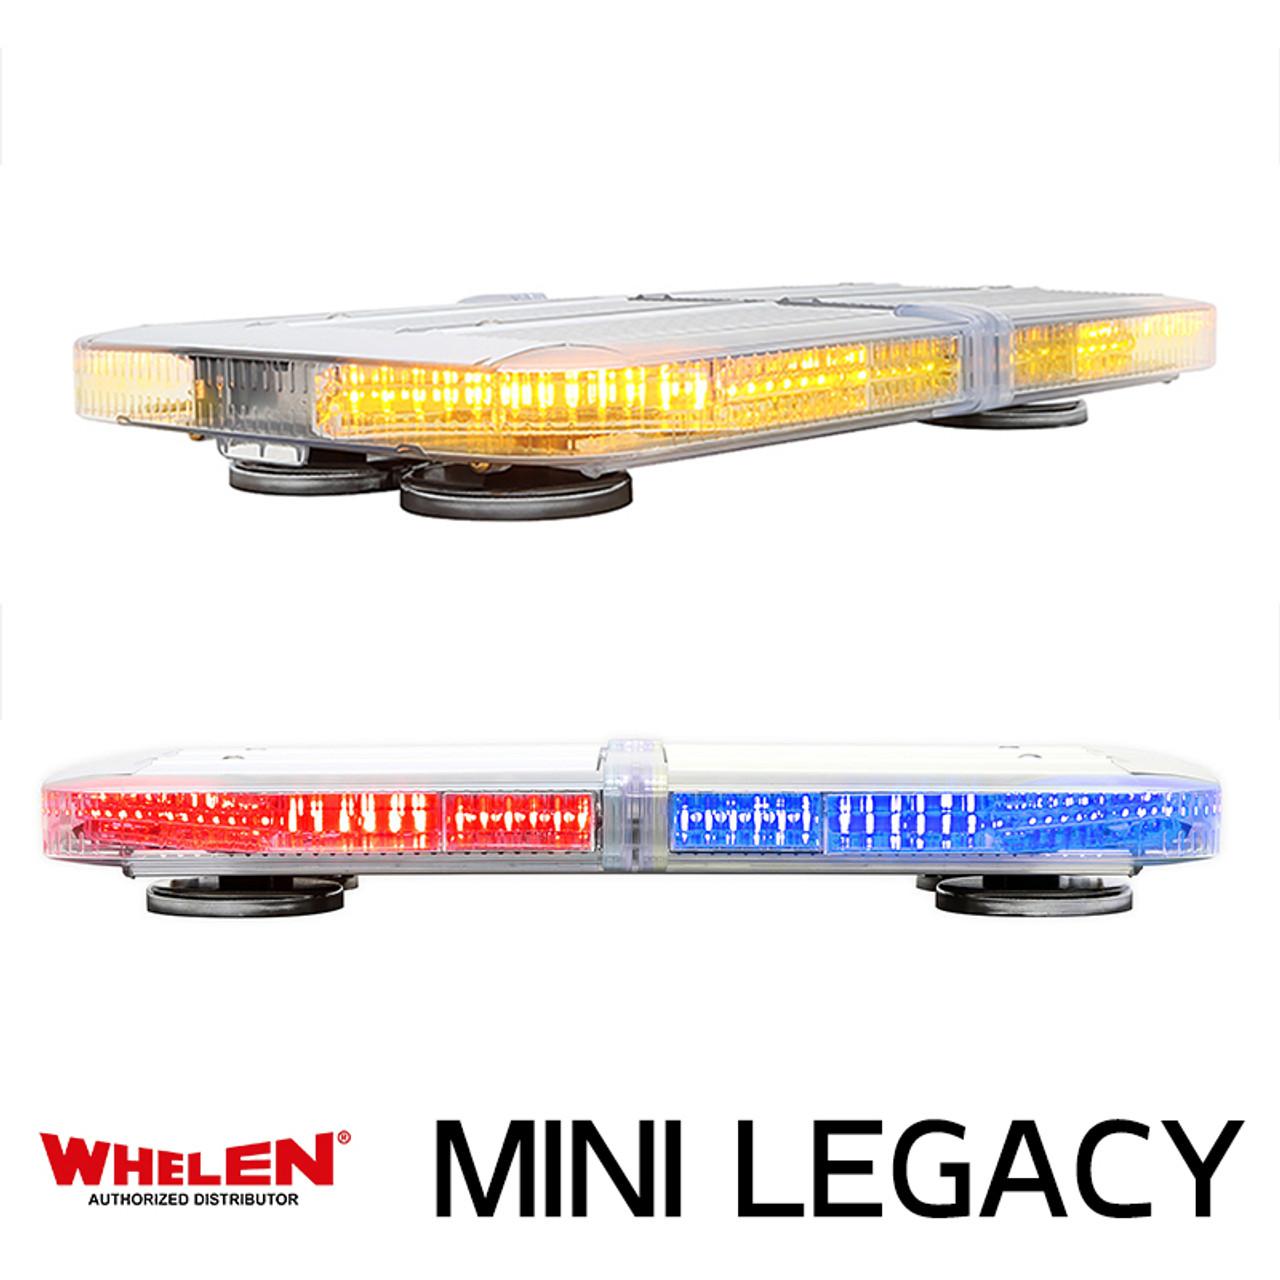 Mini Legacy GT9 Super-LED Light Bar by Whelen